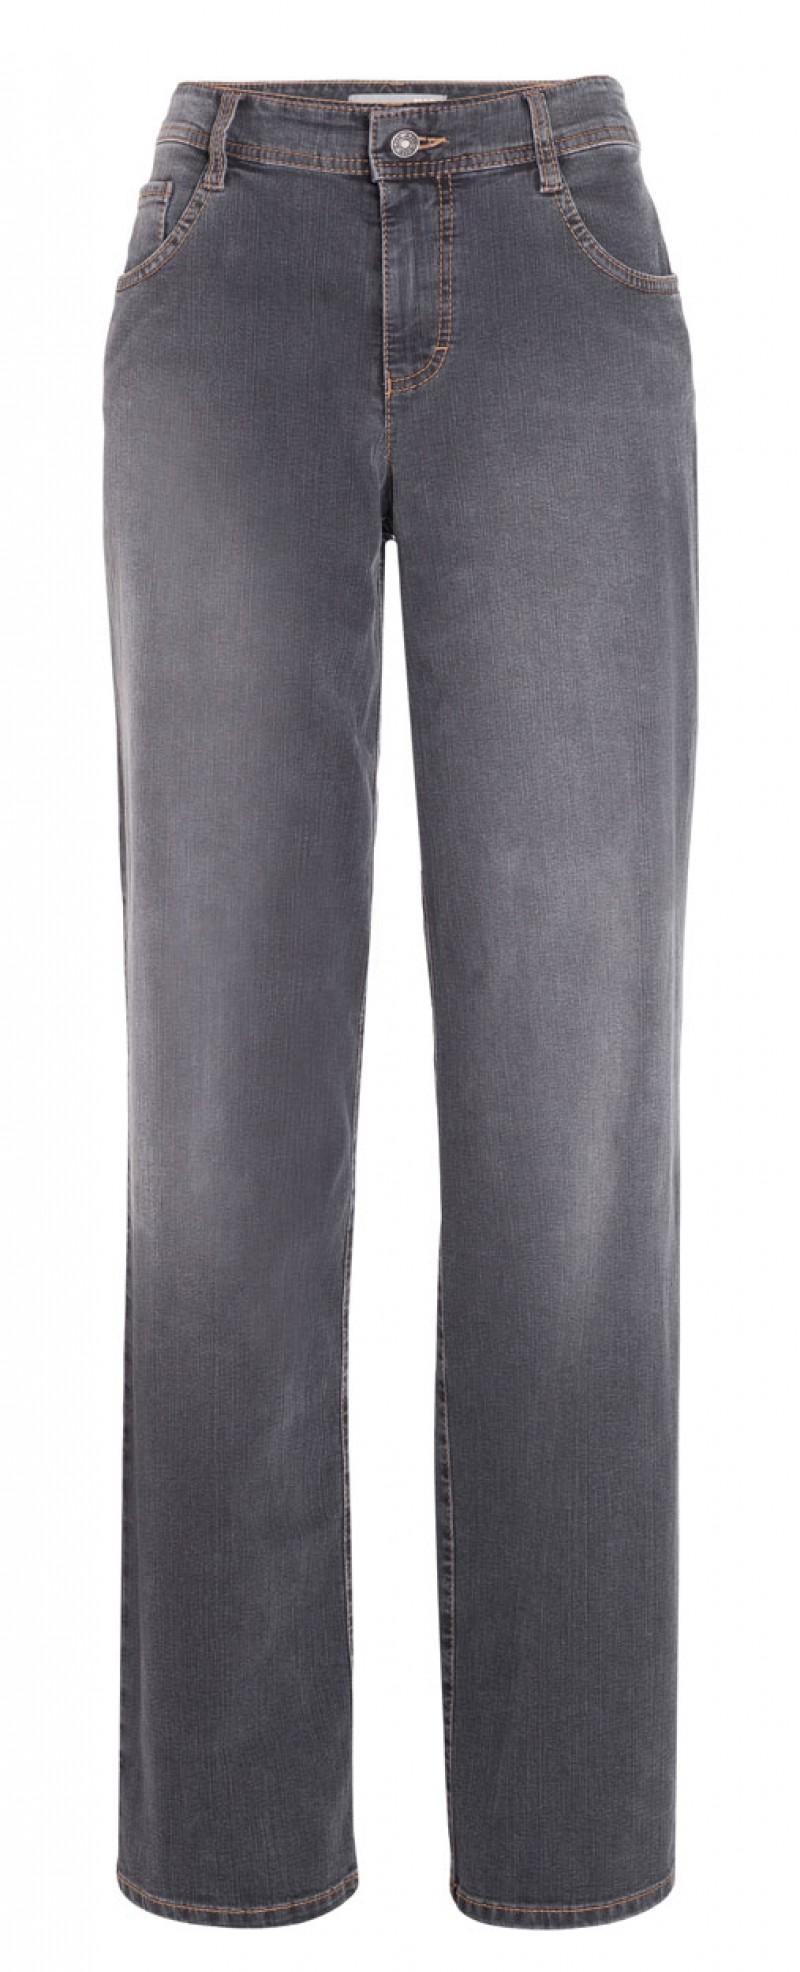 MAC Garcia Jeans - Feminine Fit - Black Bleached